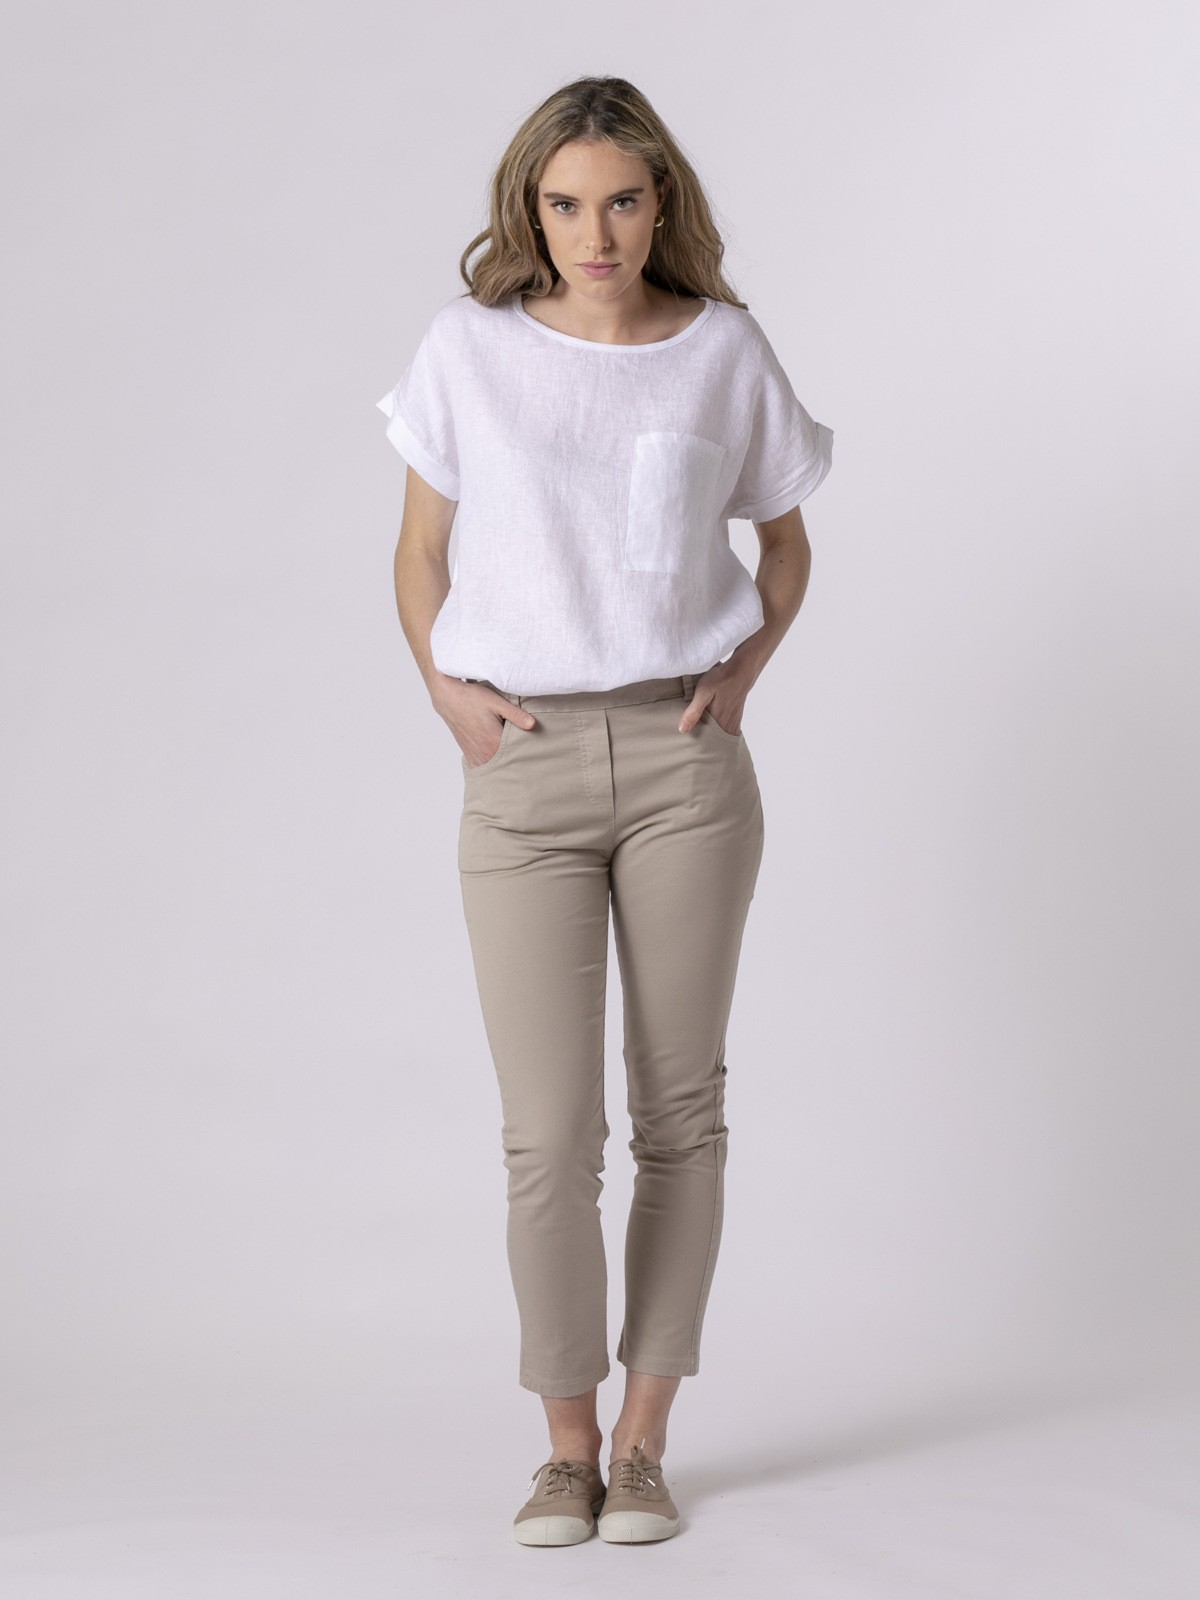 Pantalón mujer loneta confort Beige Claro